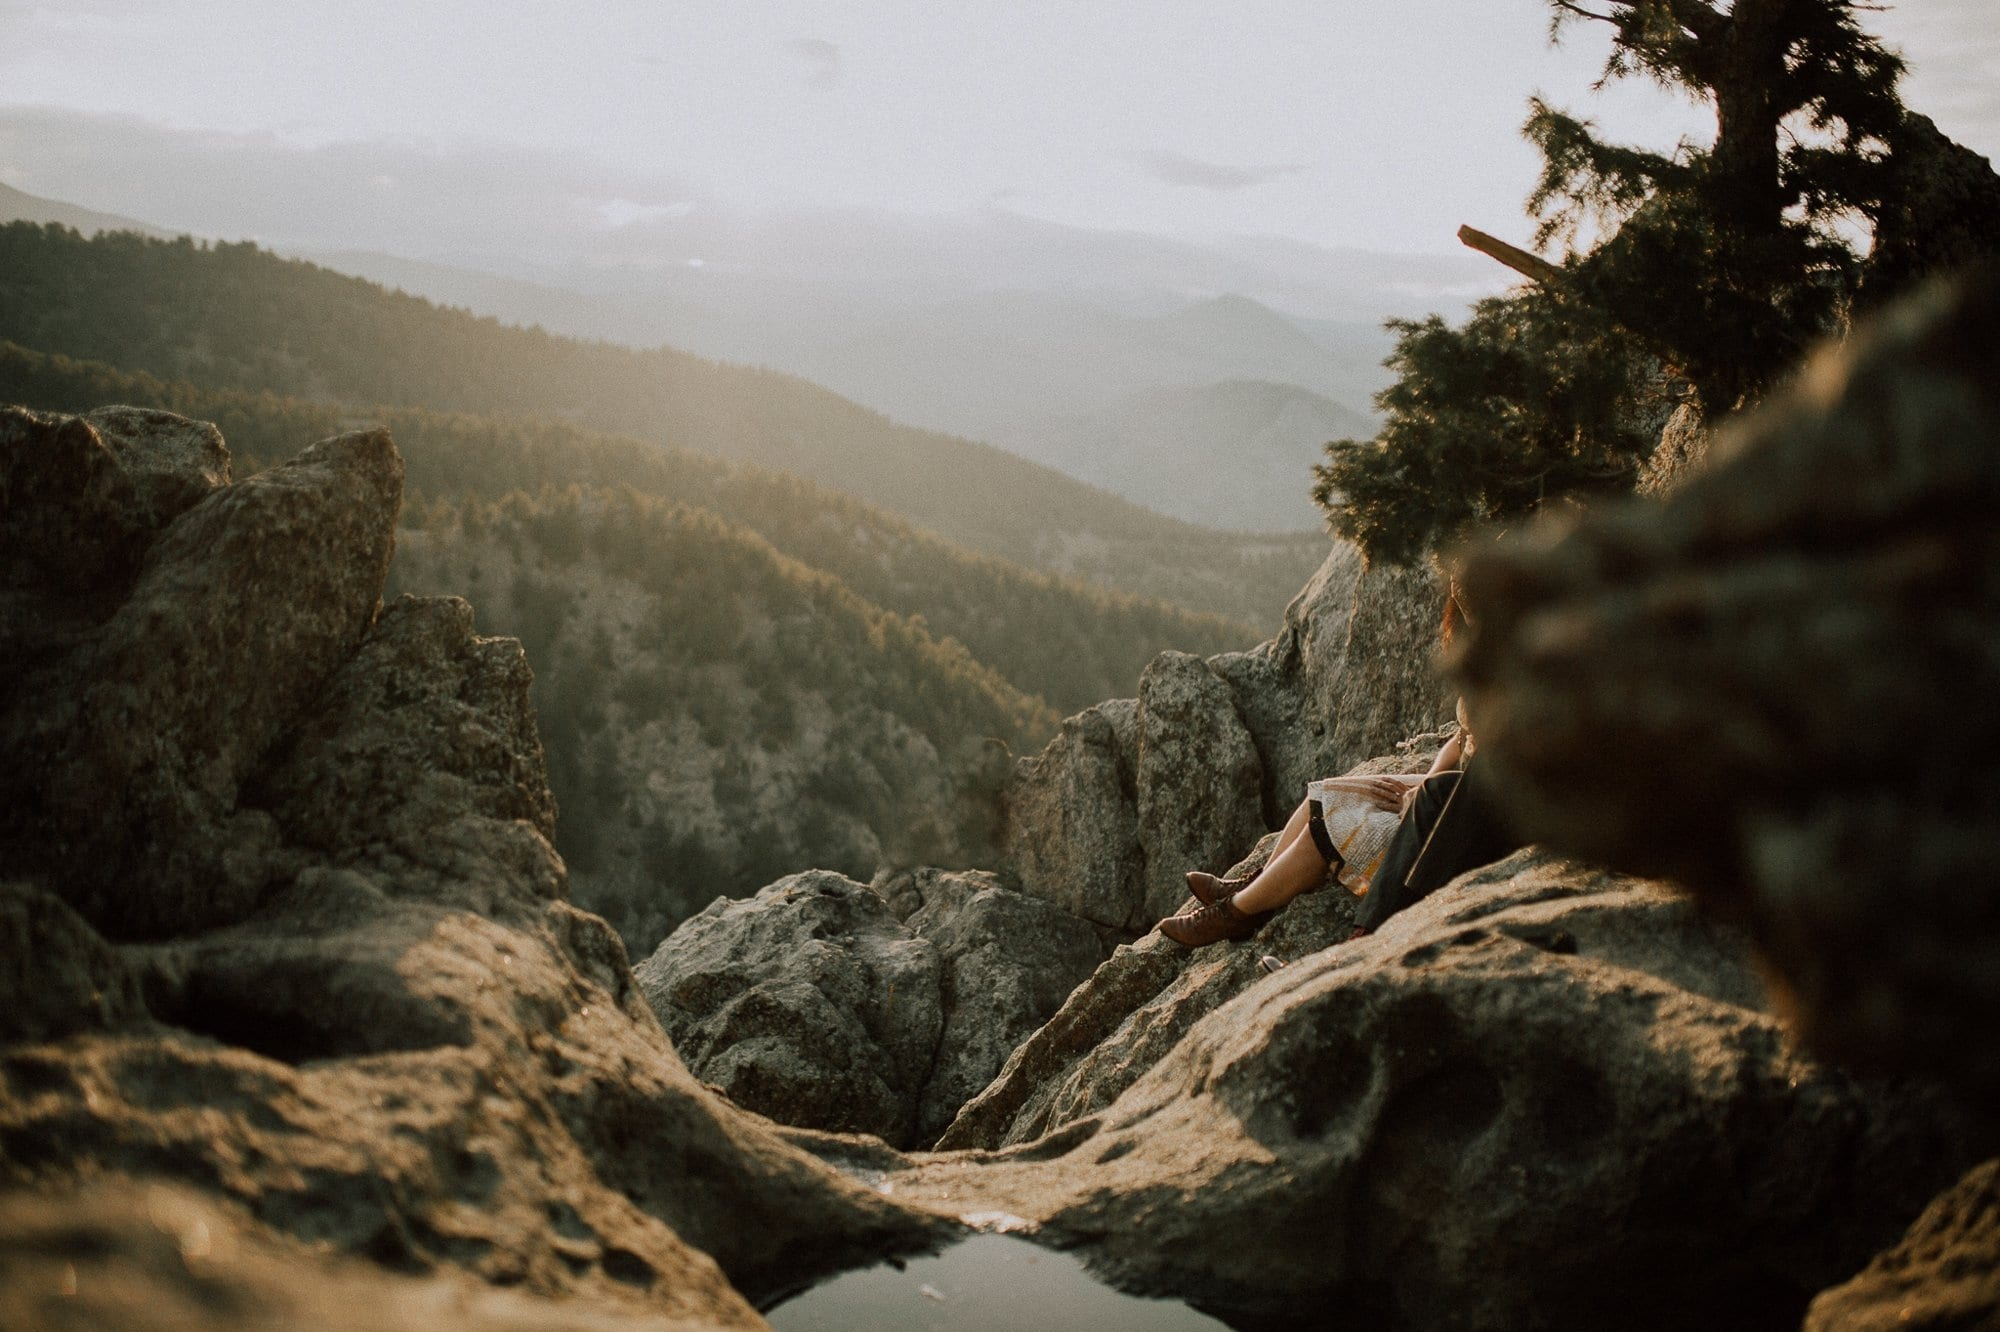 Lost Gulch Outlook, Boulder Engagement Photos, sunset,